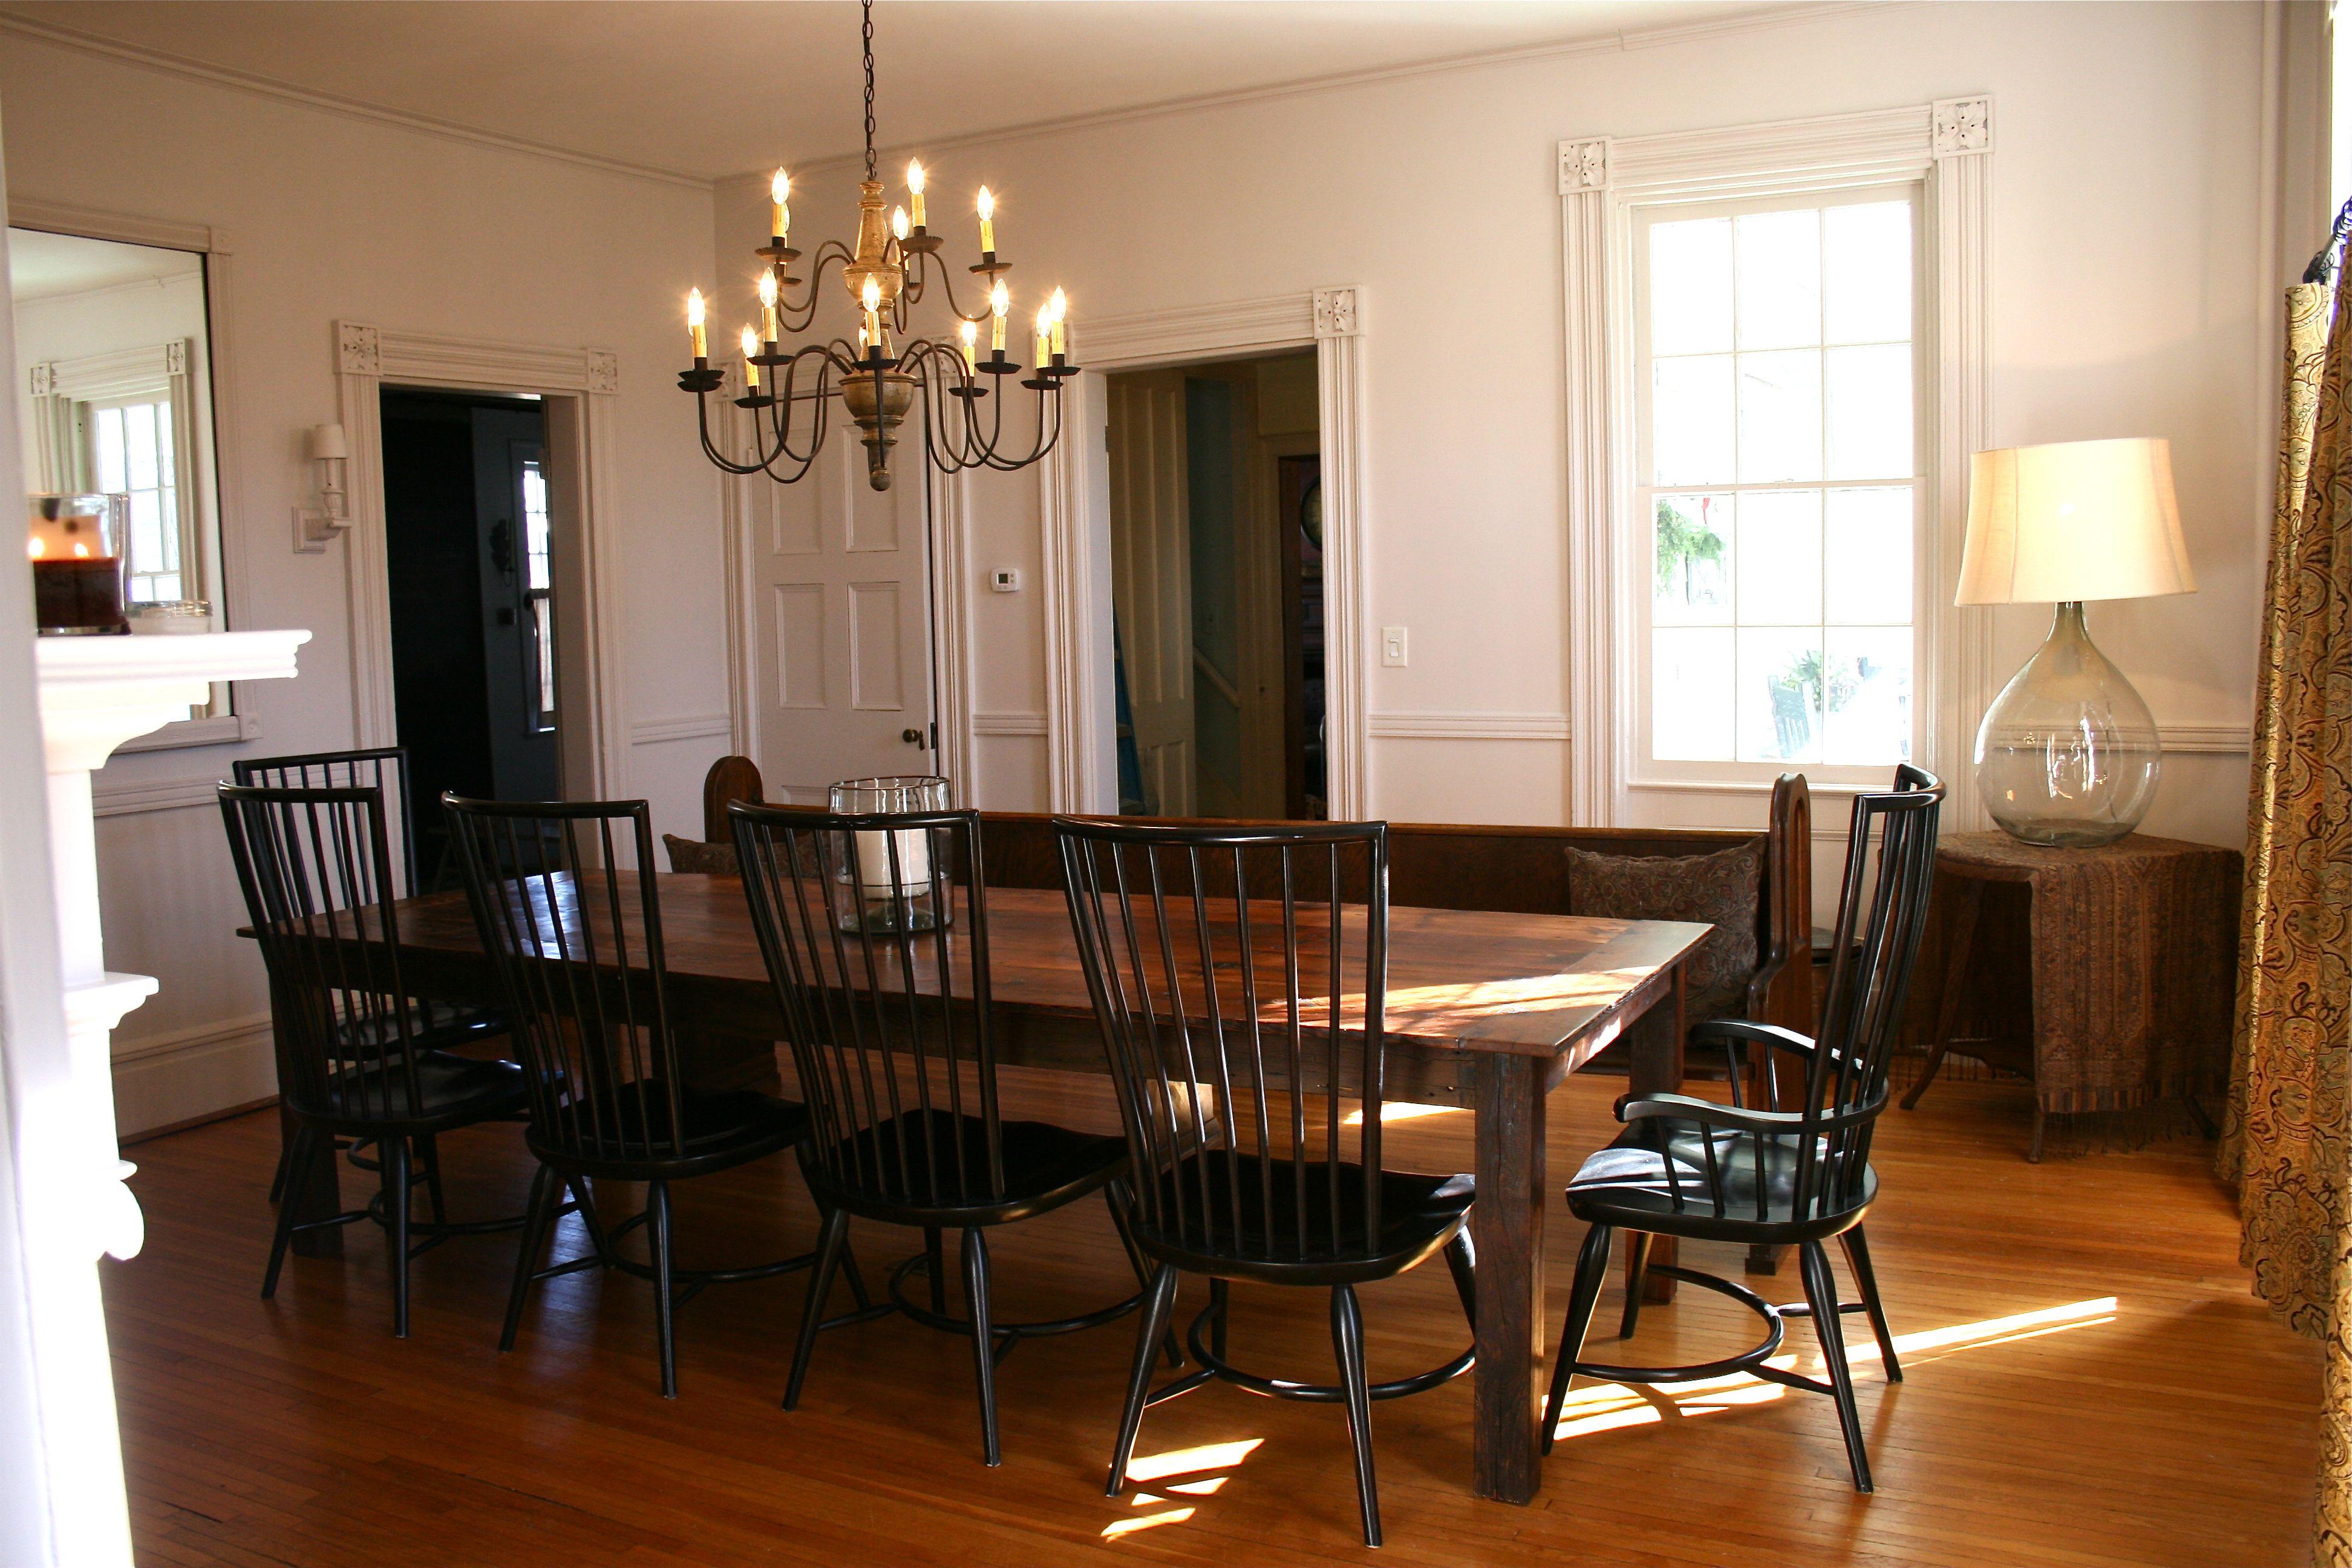 16 Inspiring Greek Revival Interior Design Photo Architecture Plans 26320